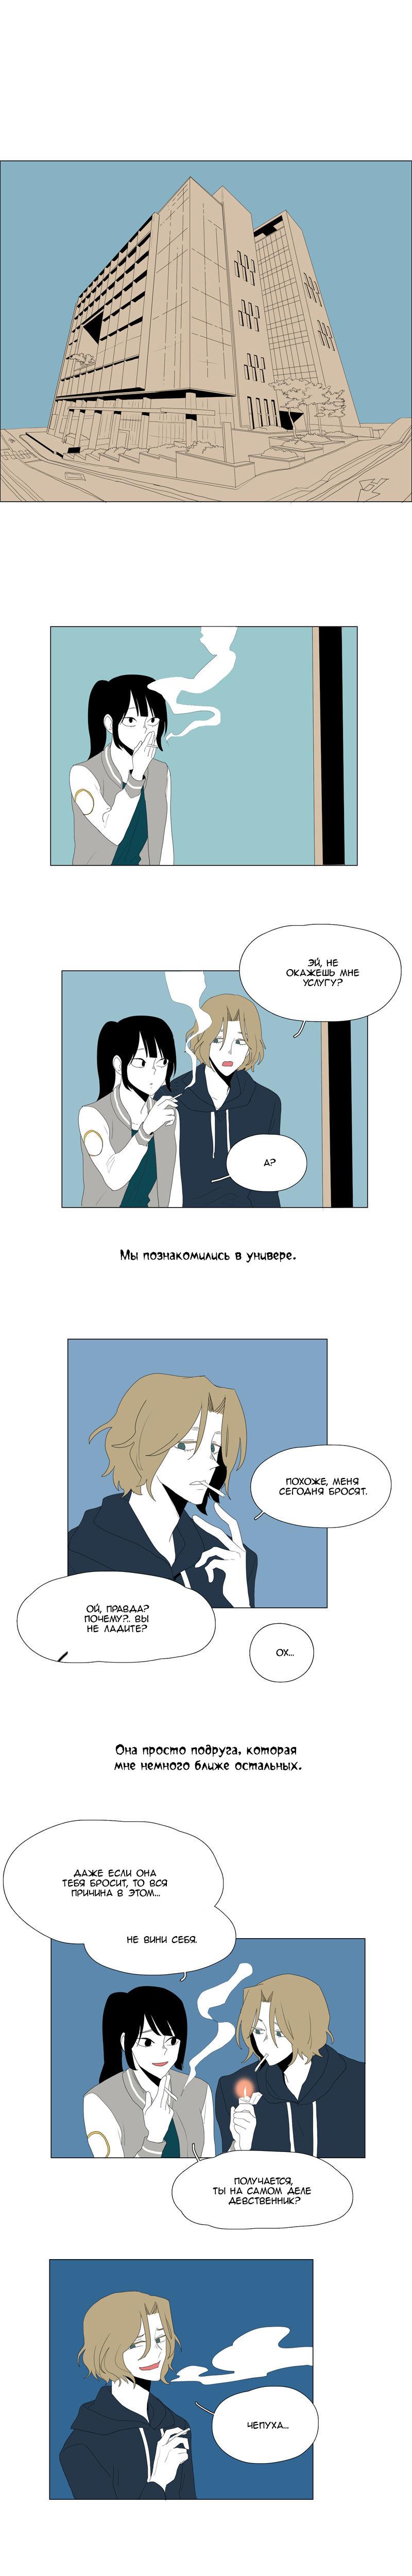 https://r1.ninemanga.com/comics/pic2/33/27873/313123/1479403200519.jpg Page 2